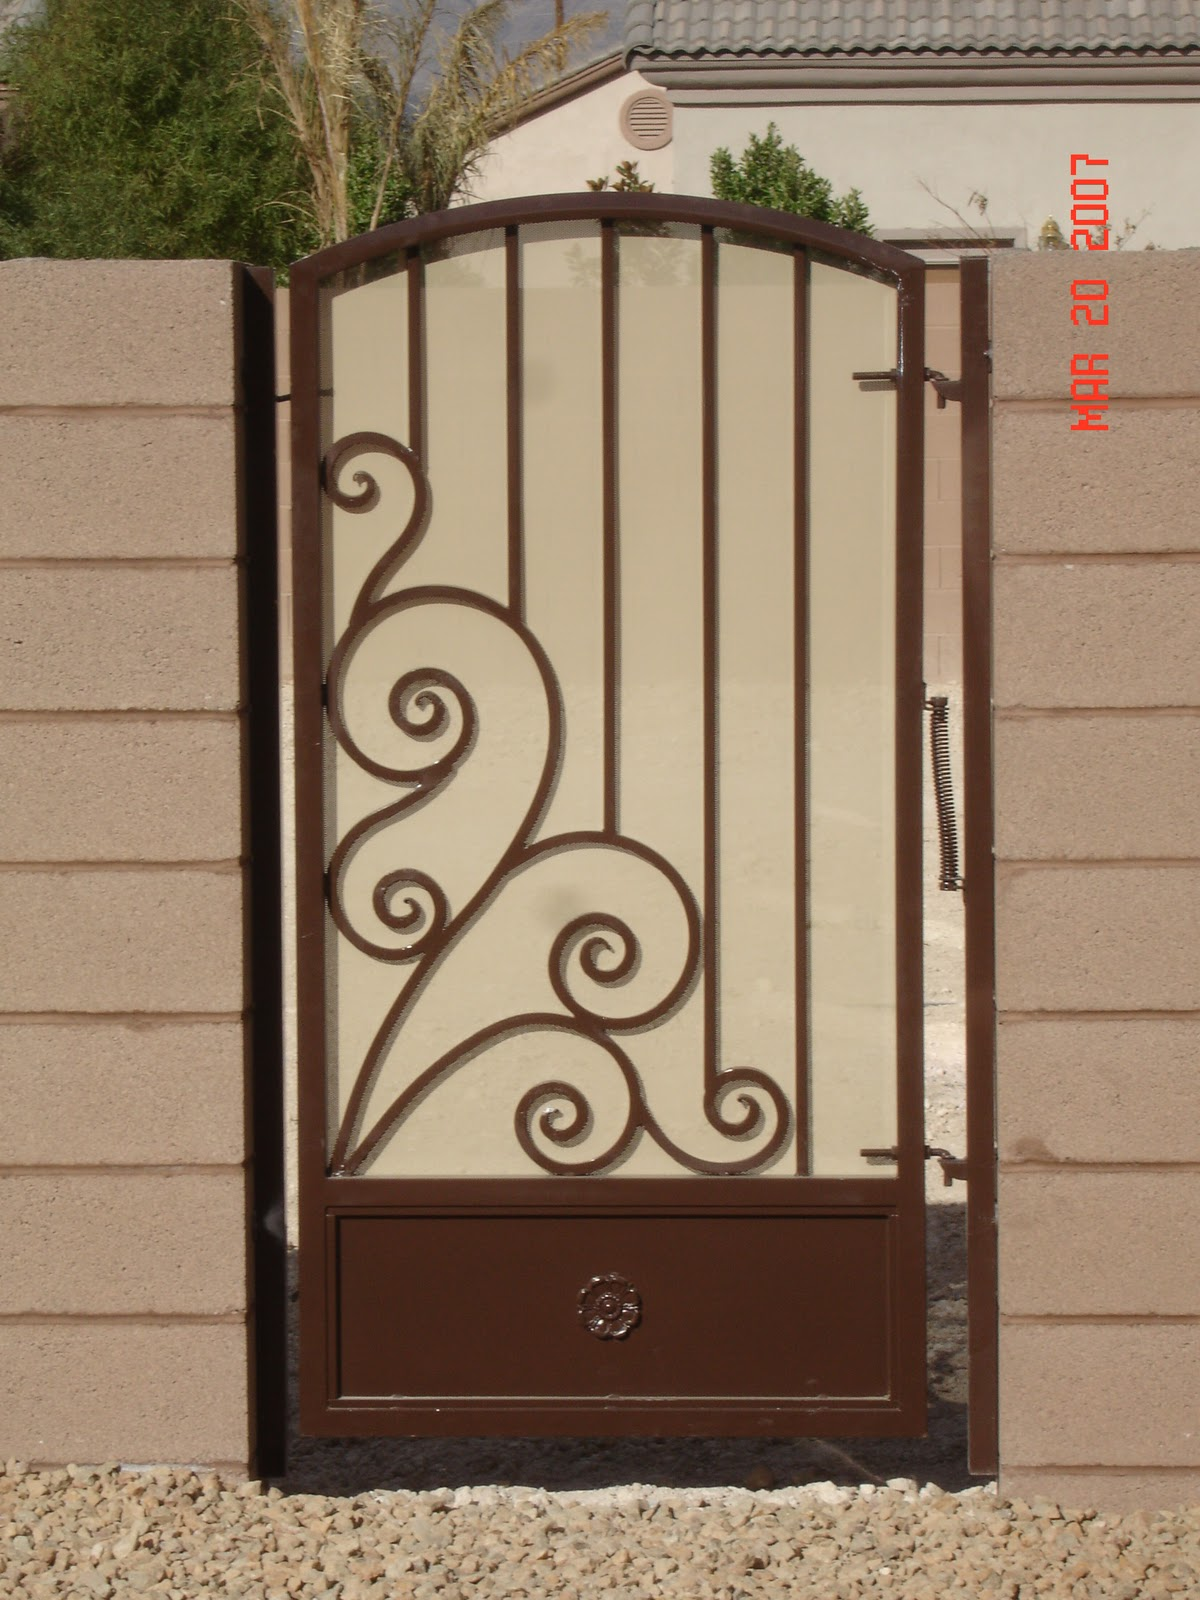 Herreria art stica hern ndez dale click en entradas for Puertas de herreria para casa